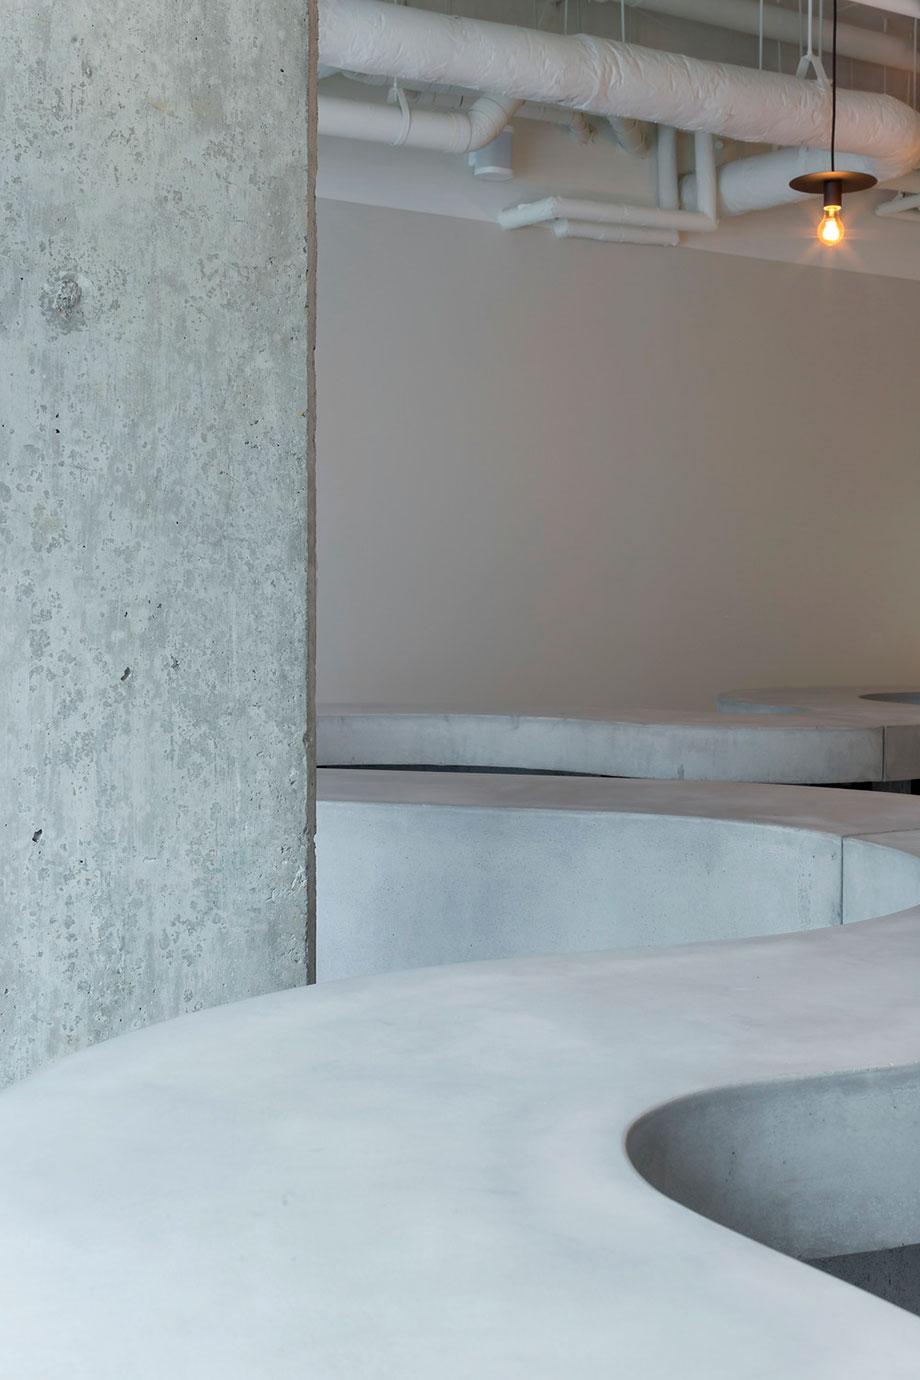 shuck shuck de batay-csorba architects (5) - foto silentsama